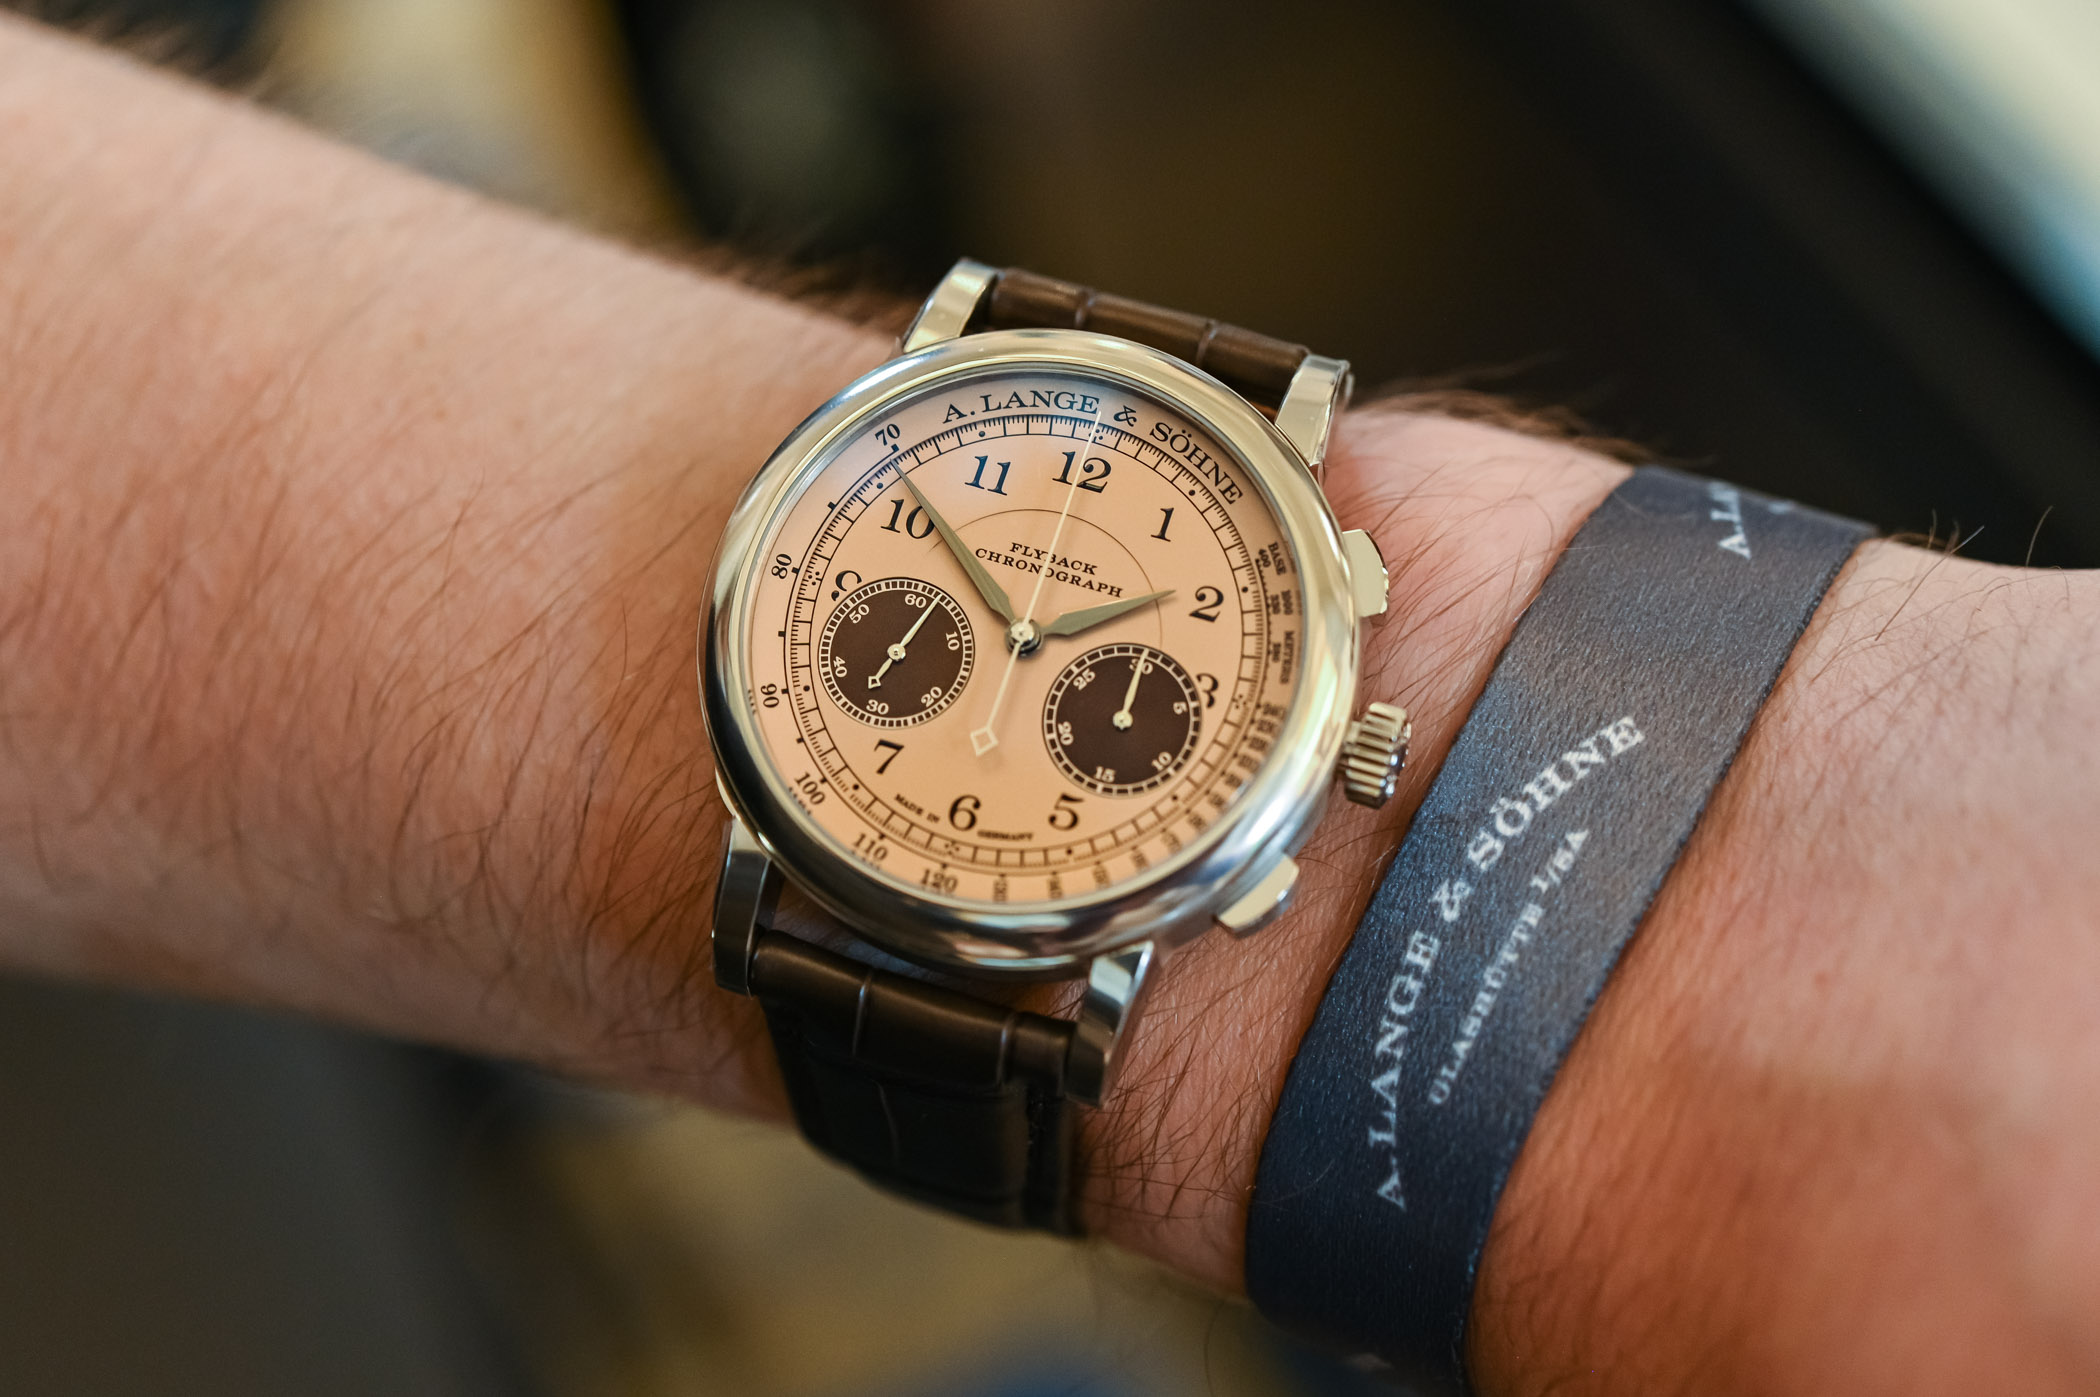 A Lange Sohne 1815 Chronograph 2021 Concorso Edition Winner's Watch - 2